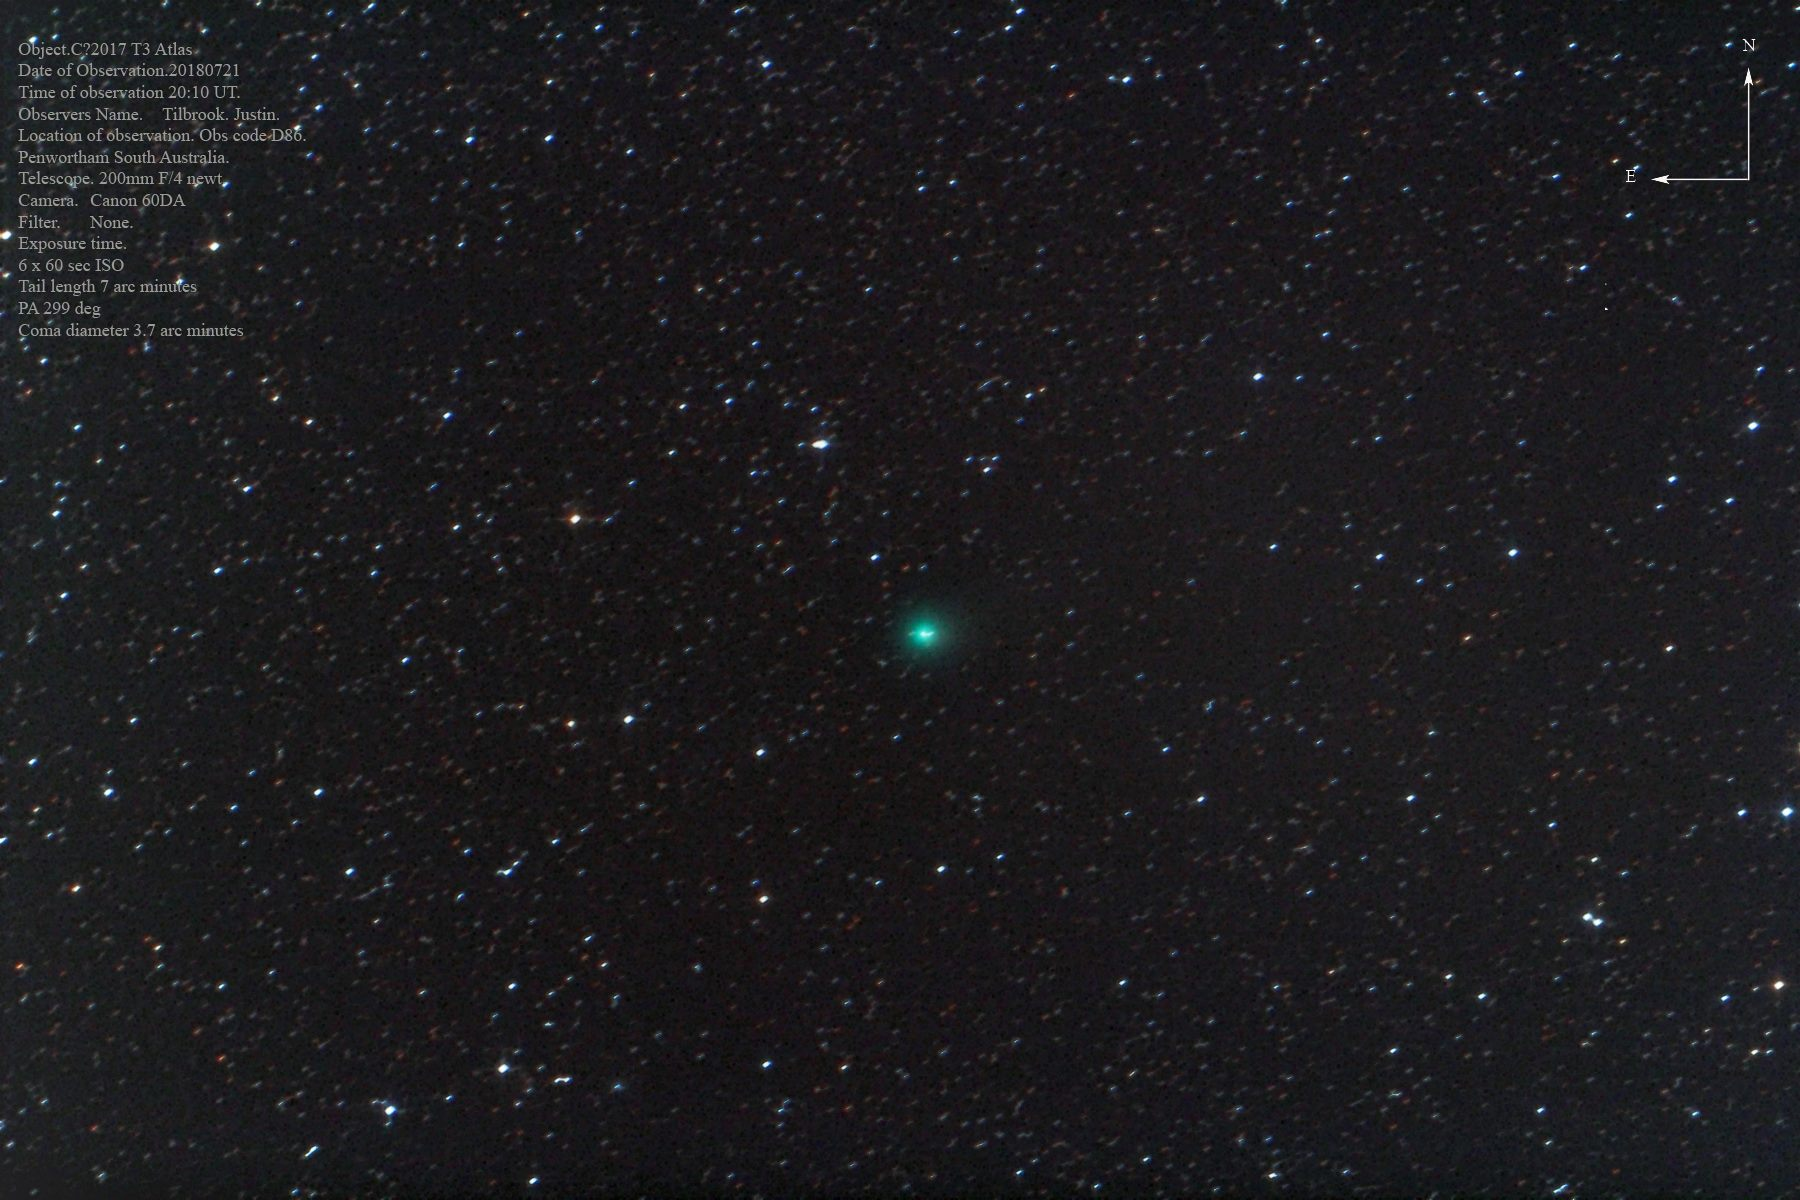 Cometa C/2017 T3 (ATLAS)